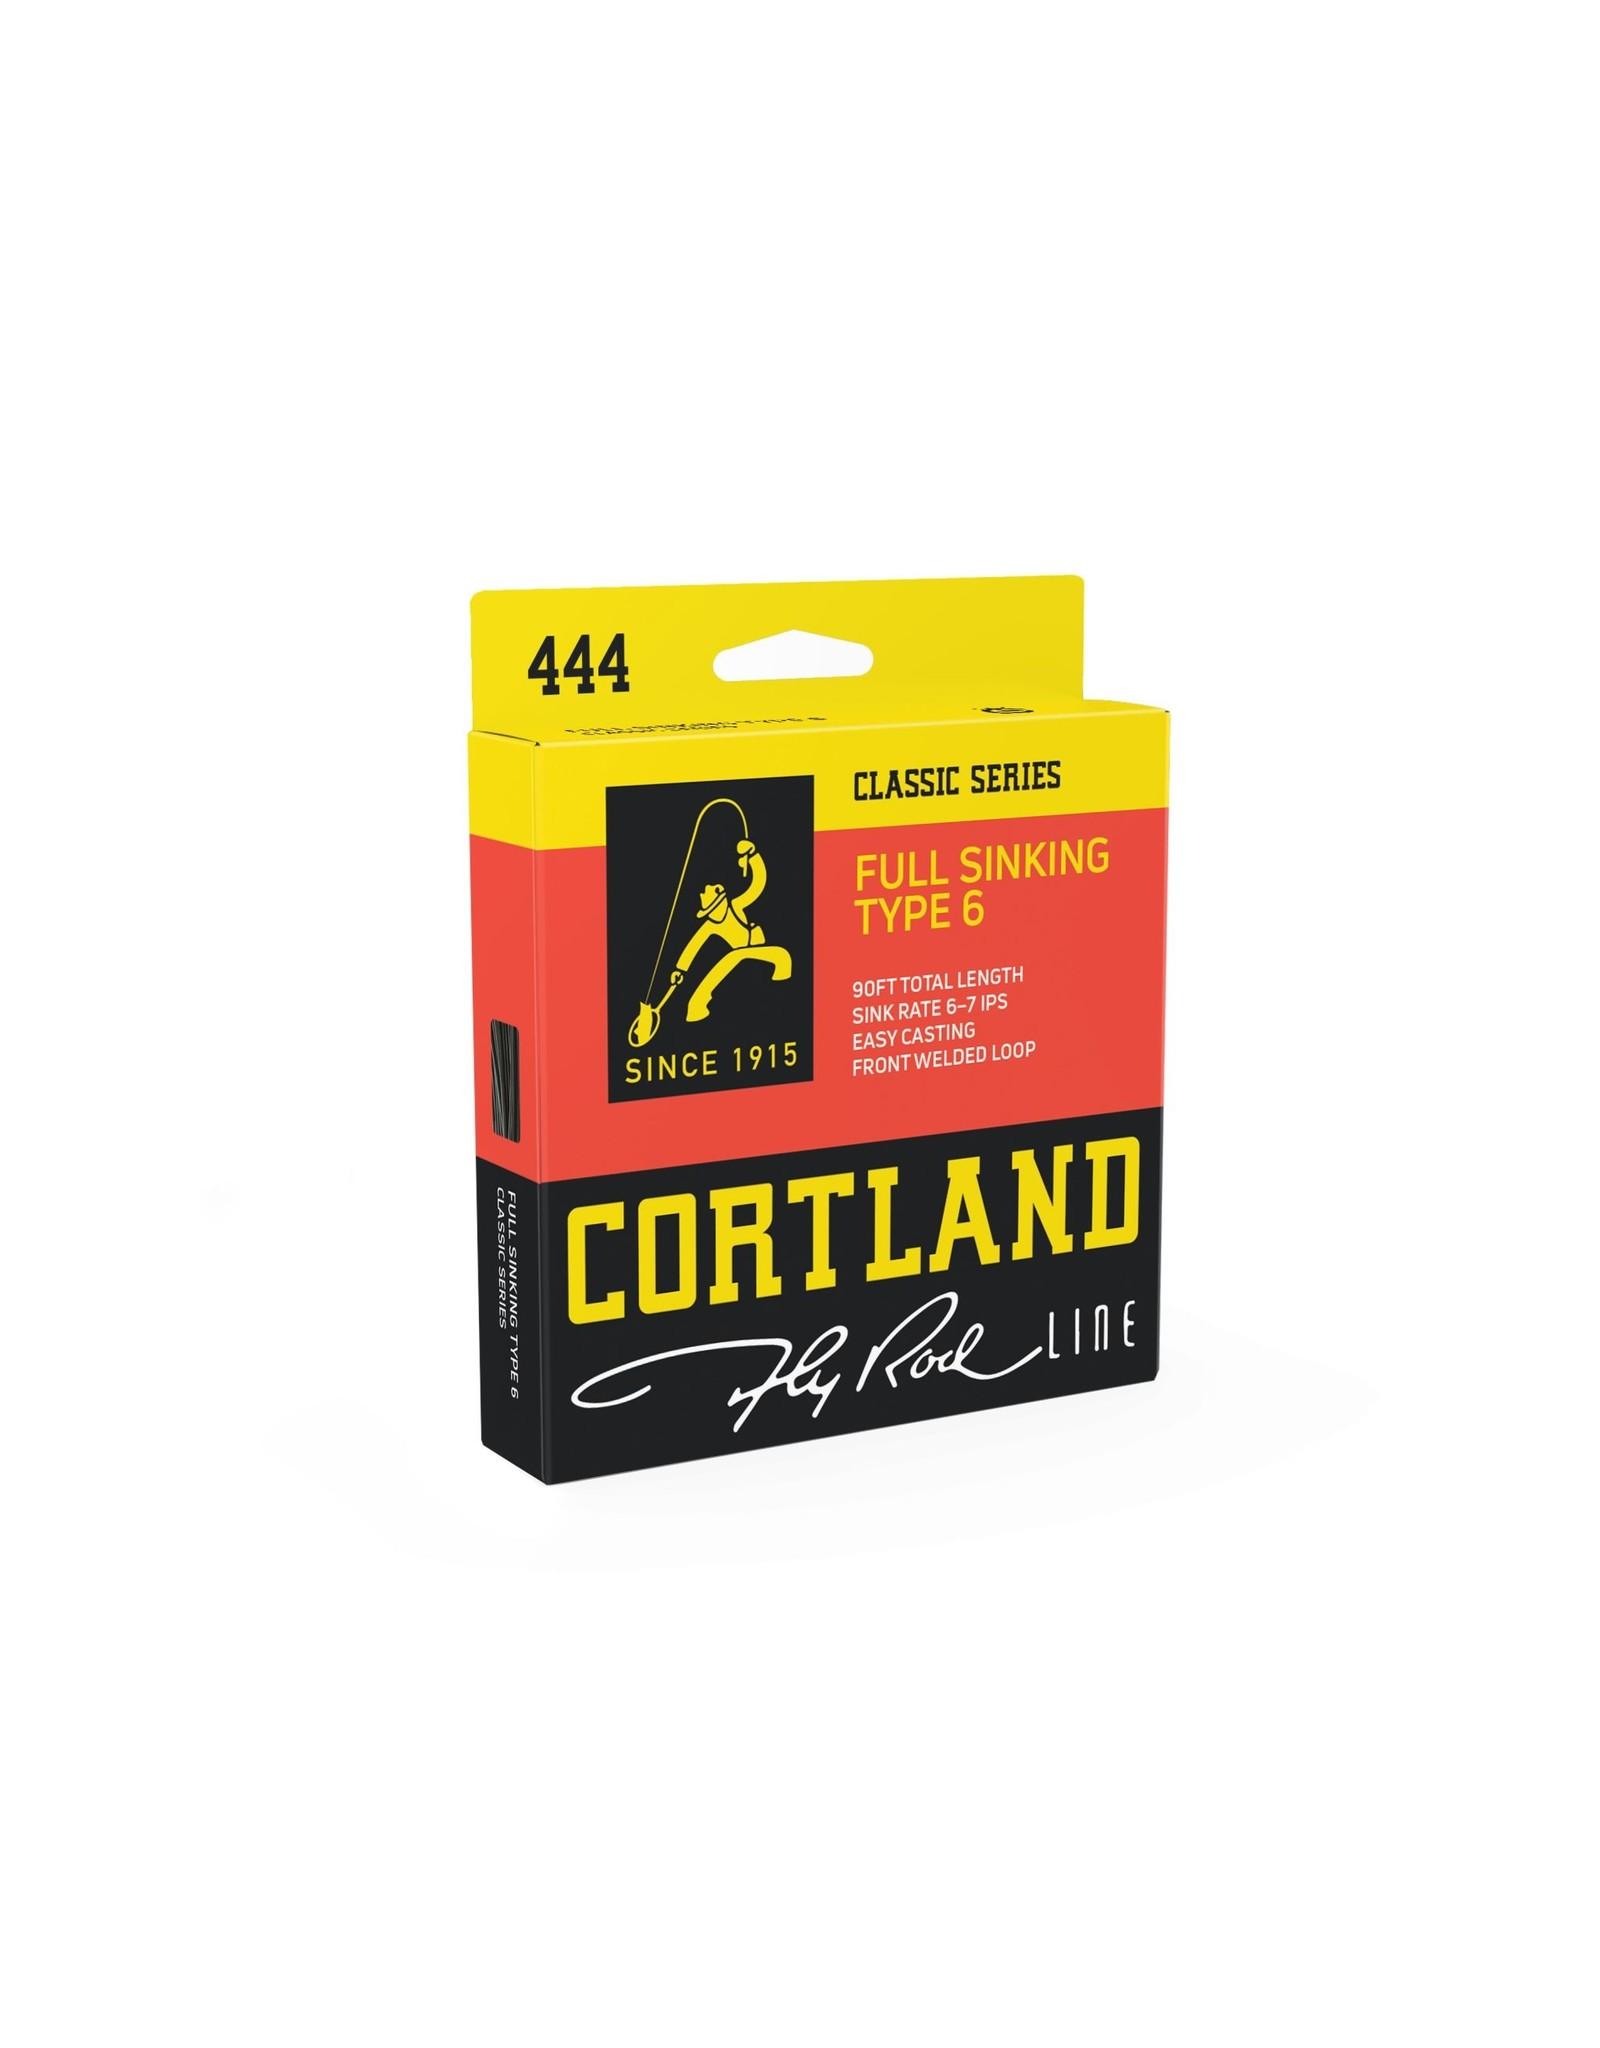 Cortland Line Cortland 444 Classic Full Sinking Type 6 Fly Line